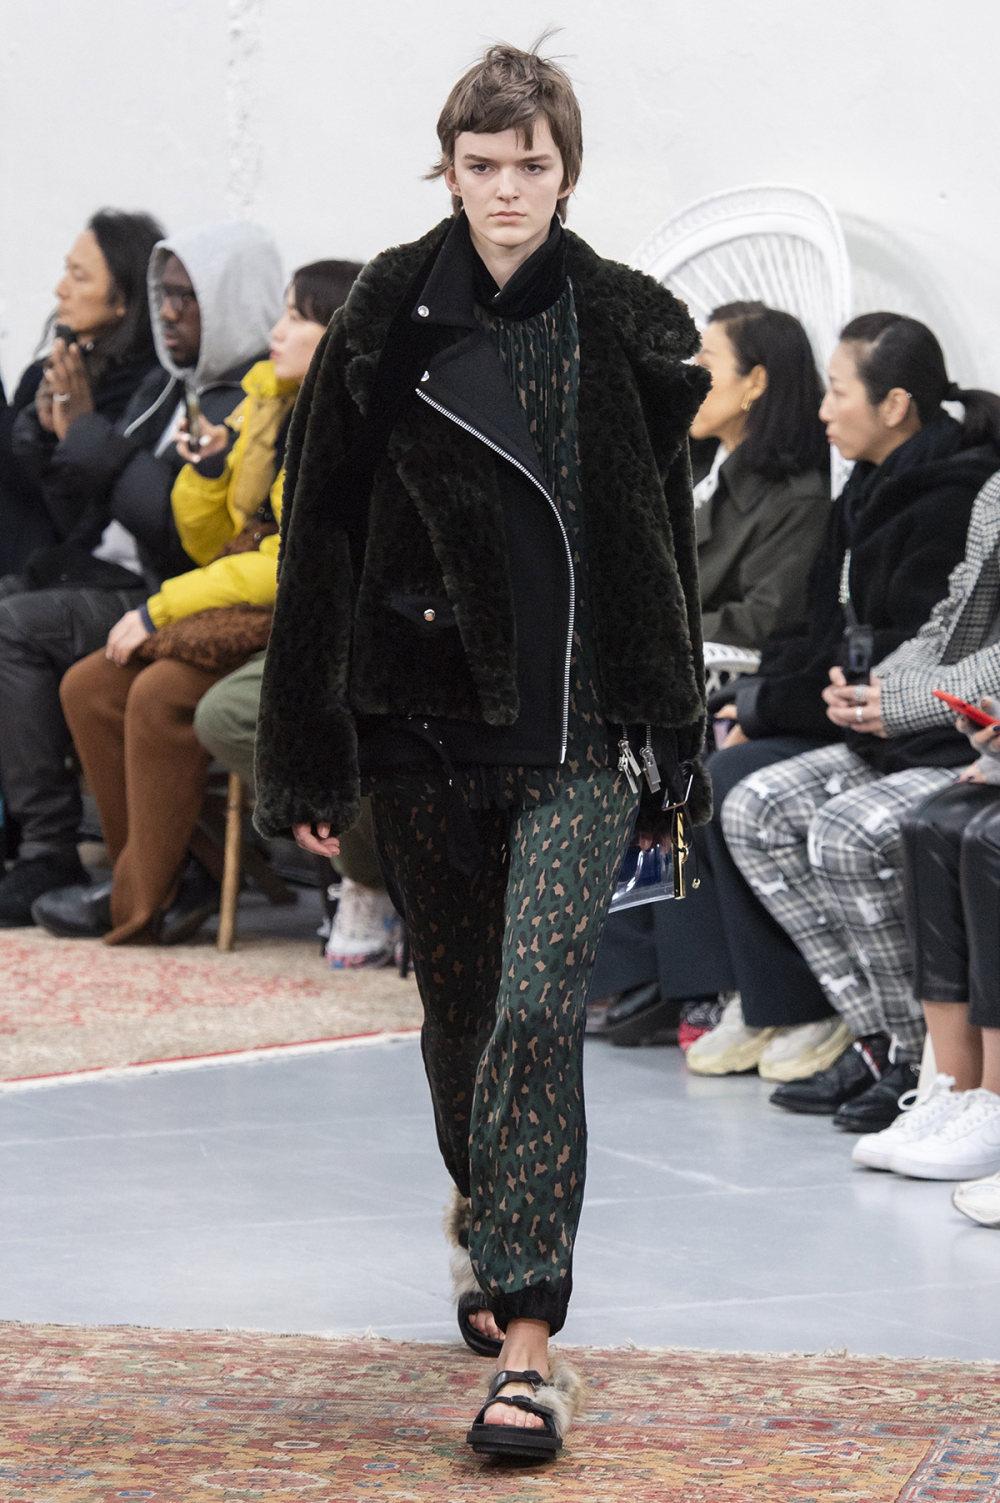 Sacai时装系列超大号黑色圆领毛衣和长款绿色北欧毛衣连衣裙-11.jpg